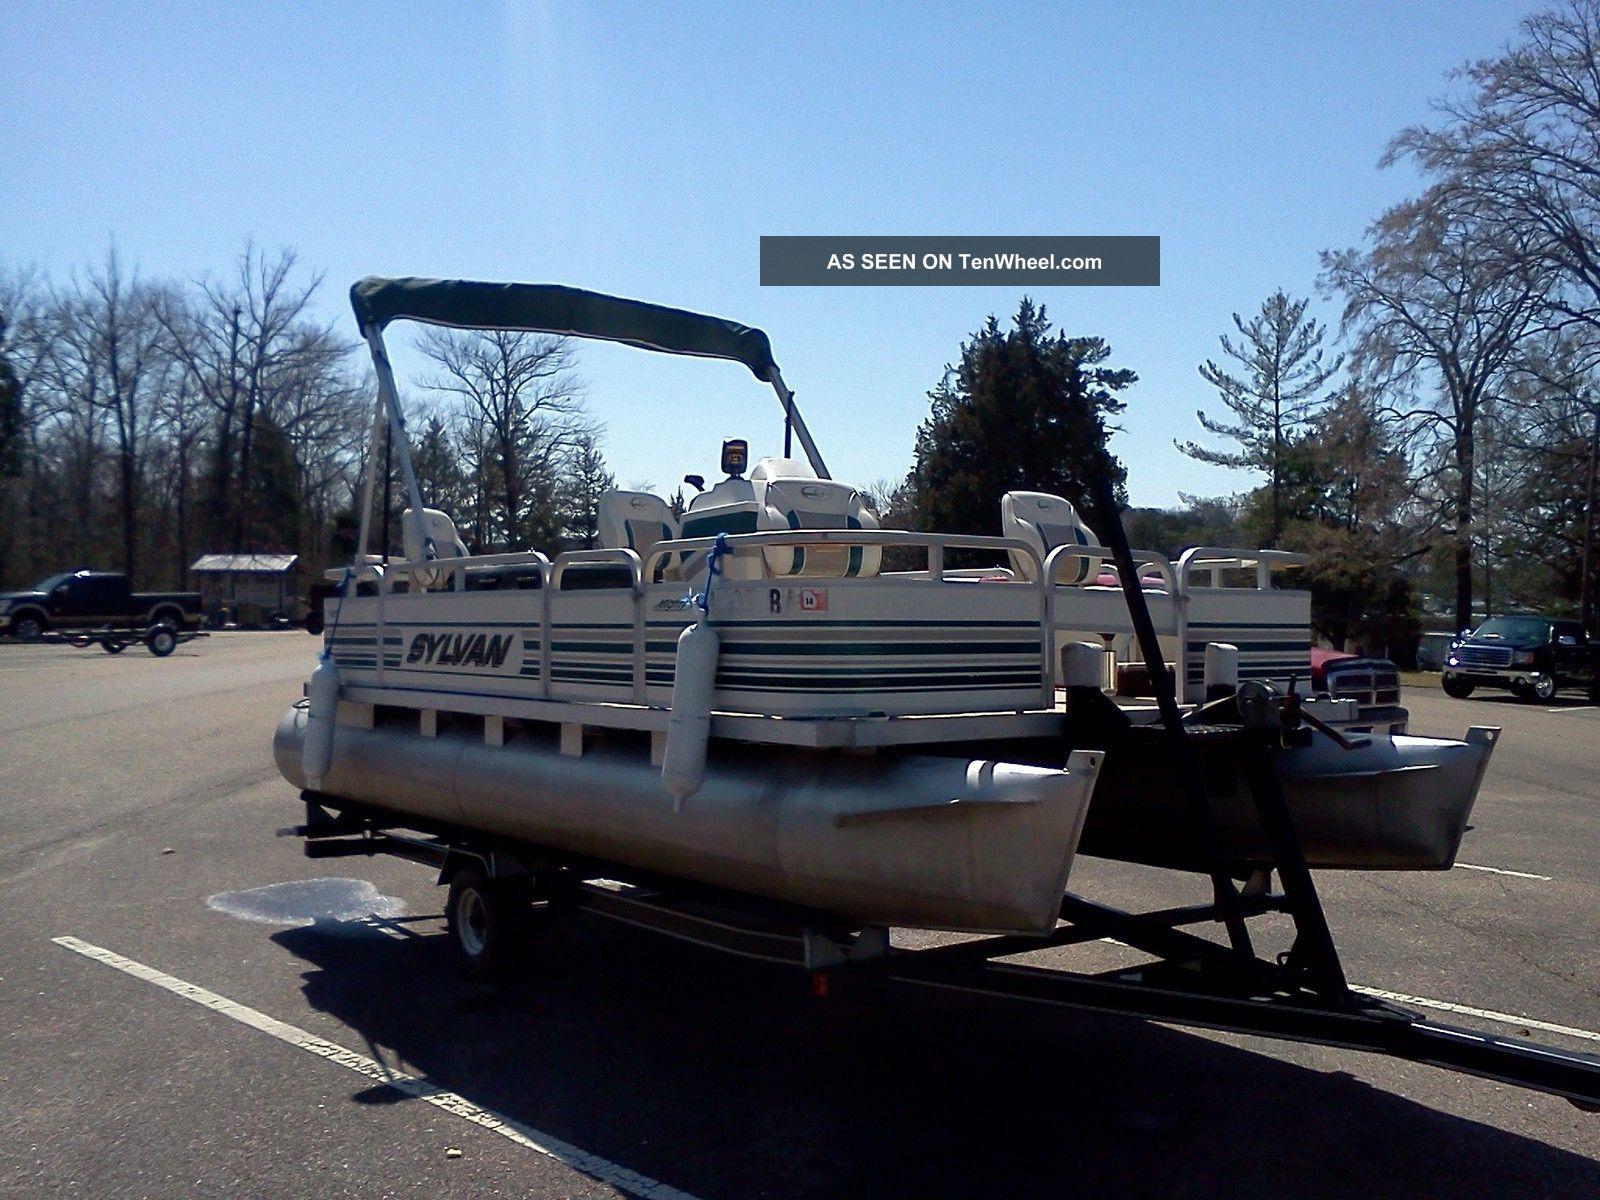 Sylvan pontoon boat lookup beforebuying for Mighty mite fishing rod